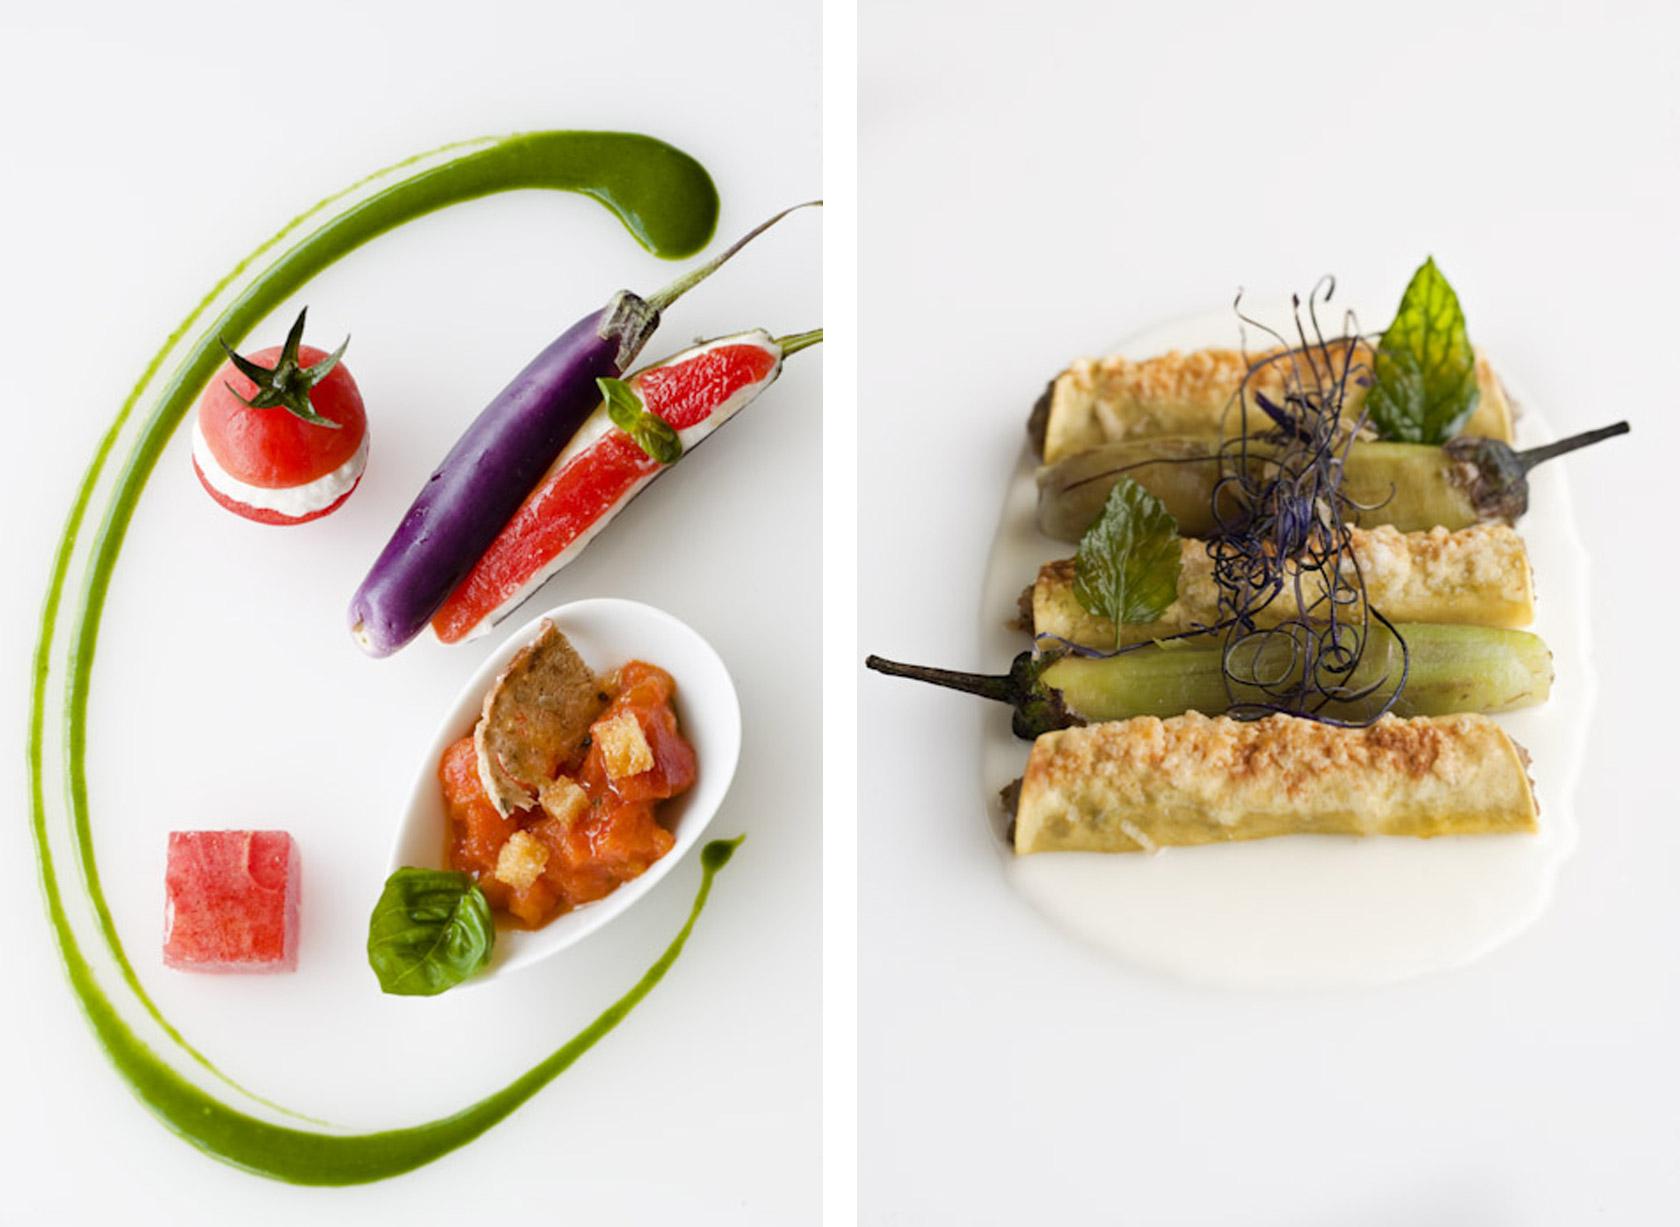 arnolfo-ristornate-melanzane-gaetano-trovato-chef